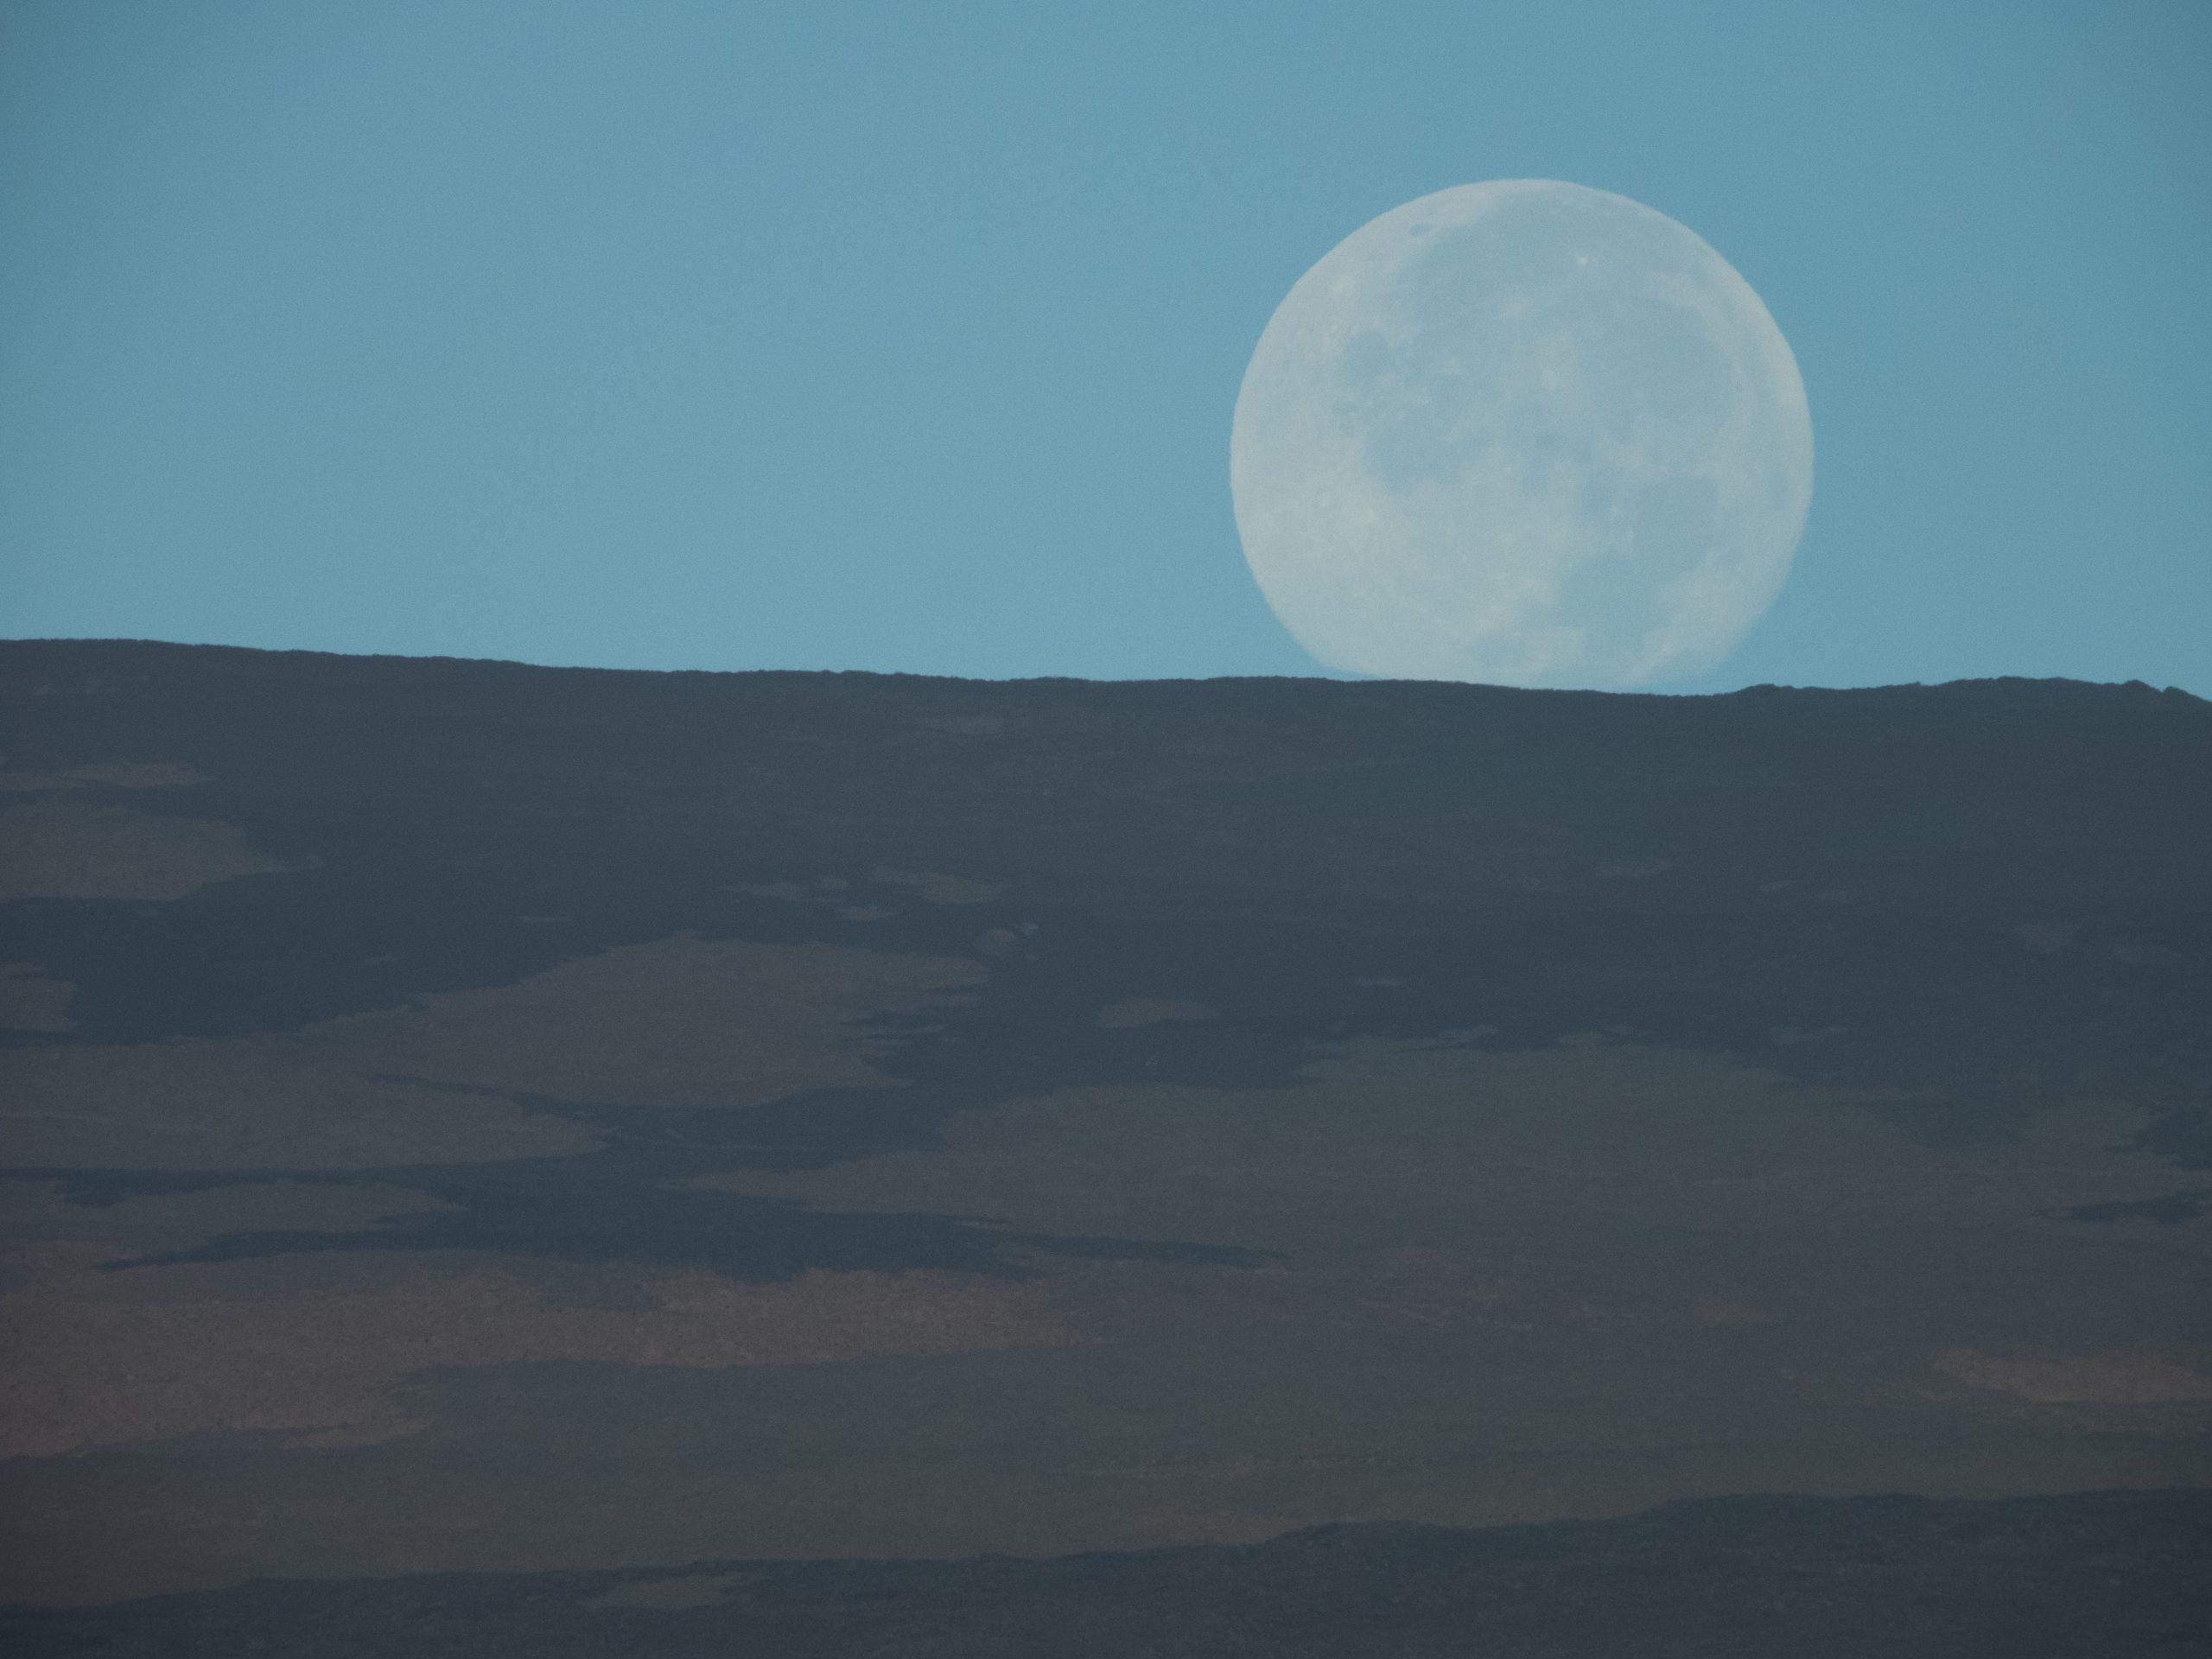 Volcano Watch: Tiny Changes at Mauna Loa's Summit Hold Big Clues